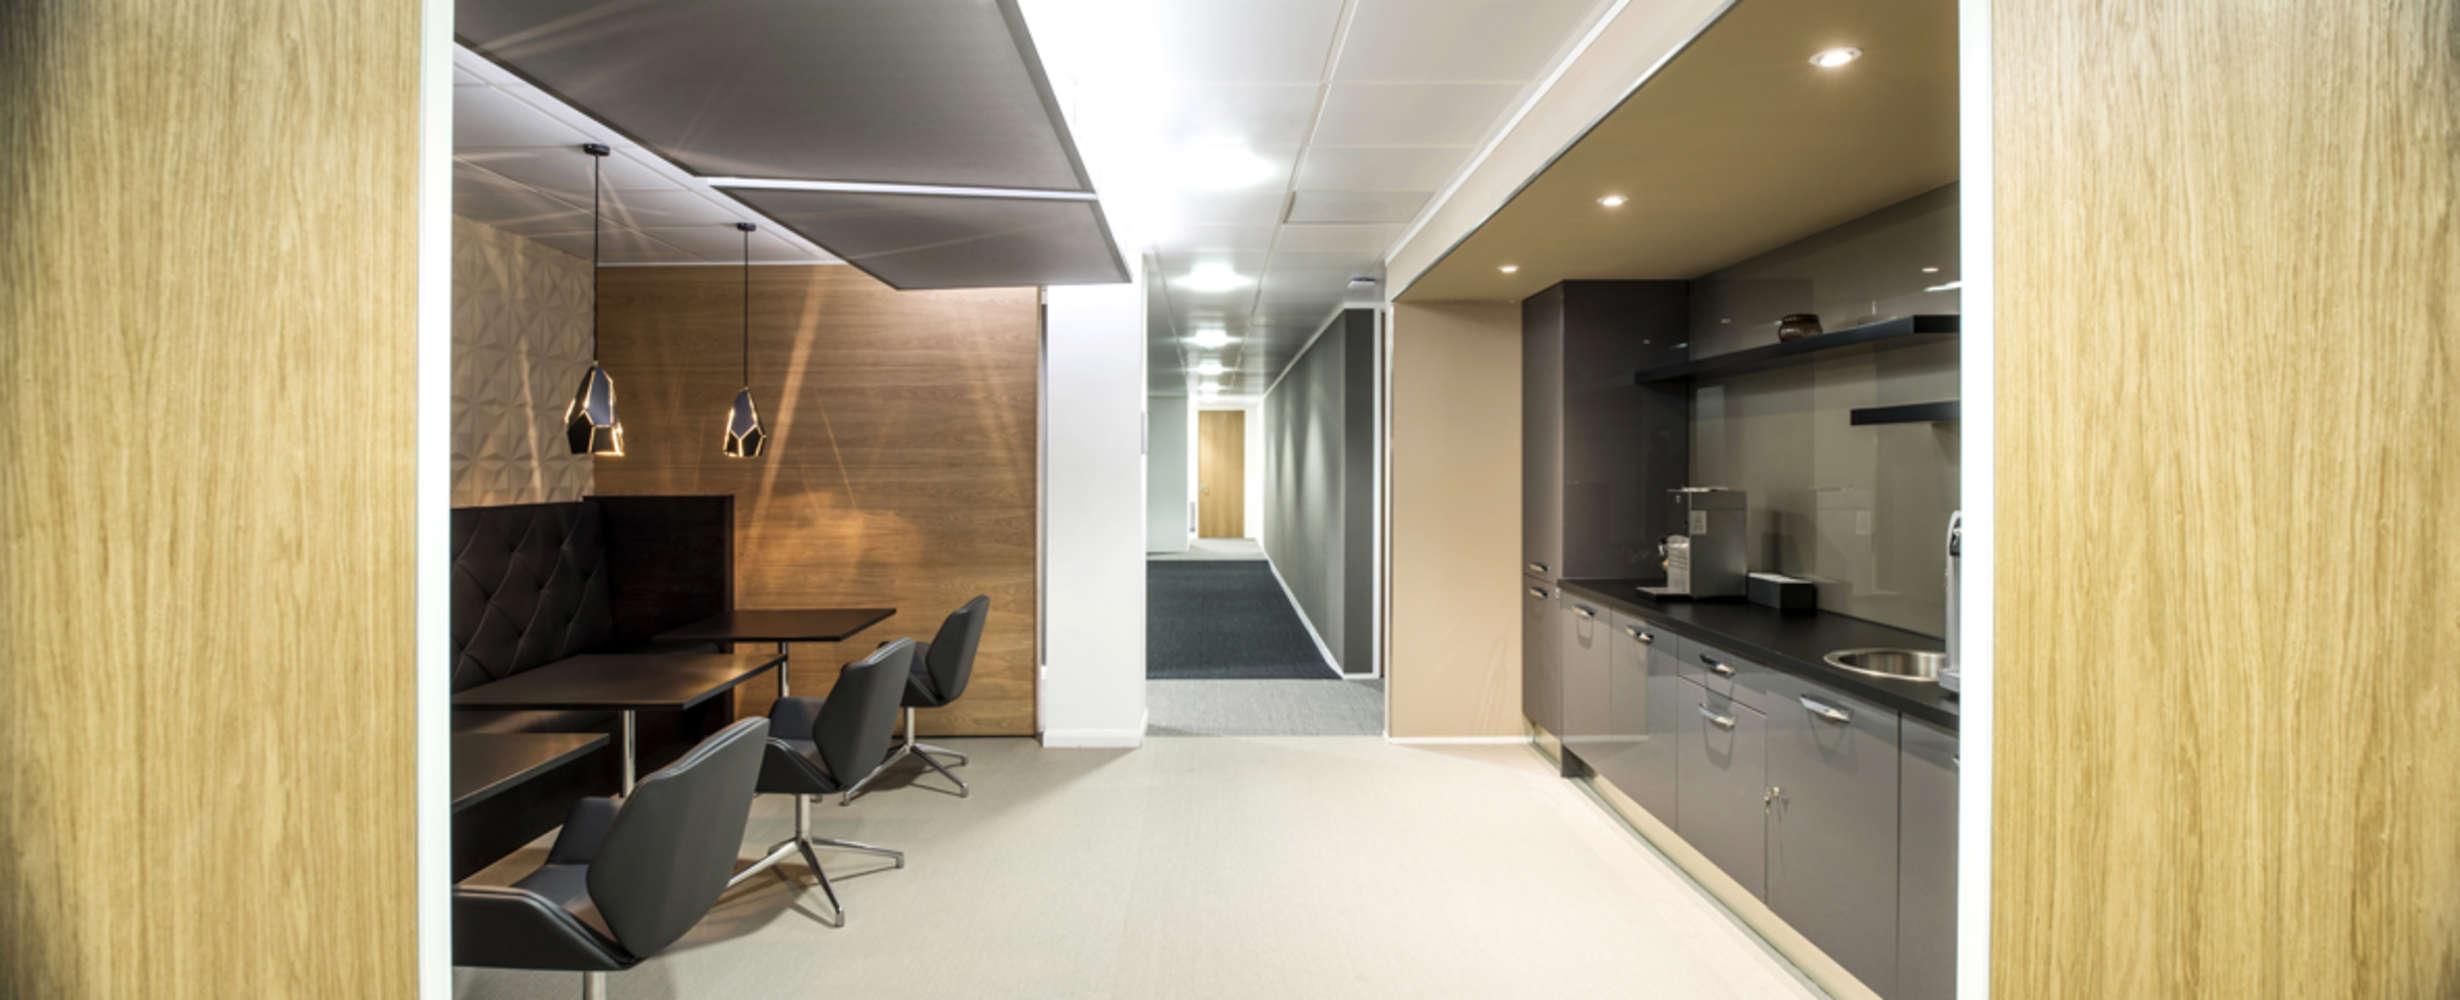 Serviced office London, EC4Y 0AB - Tallis House  - 157